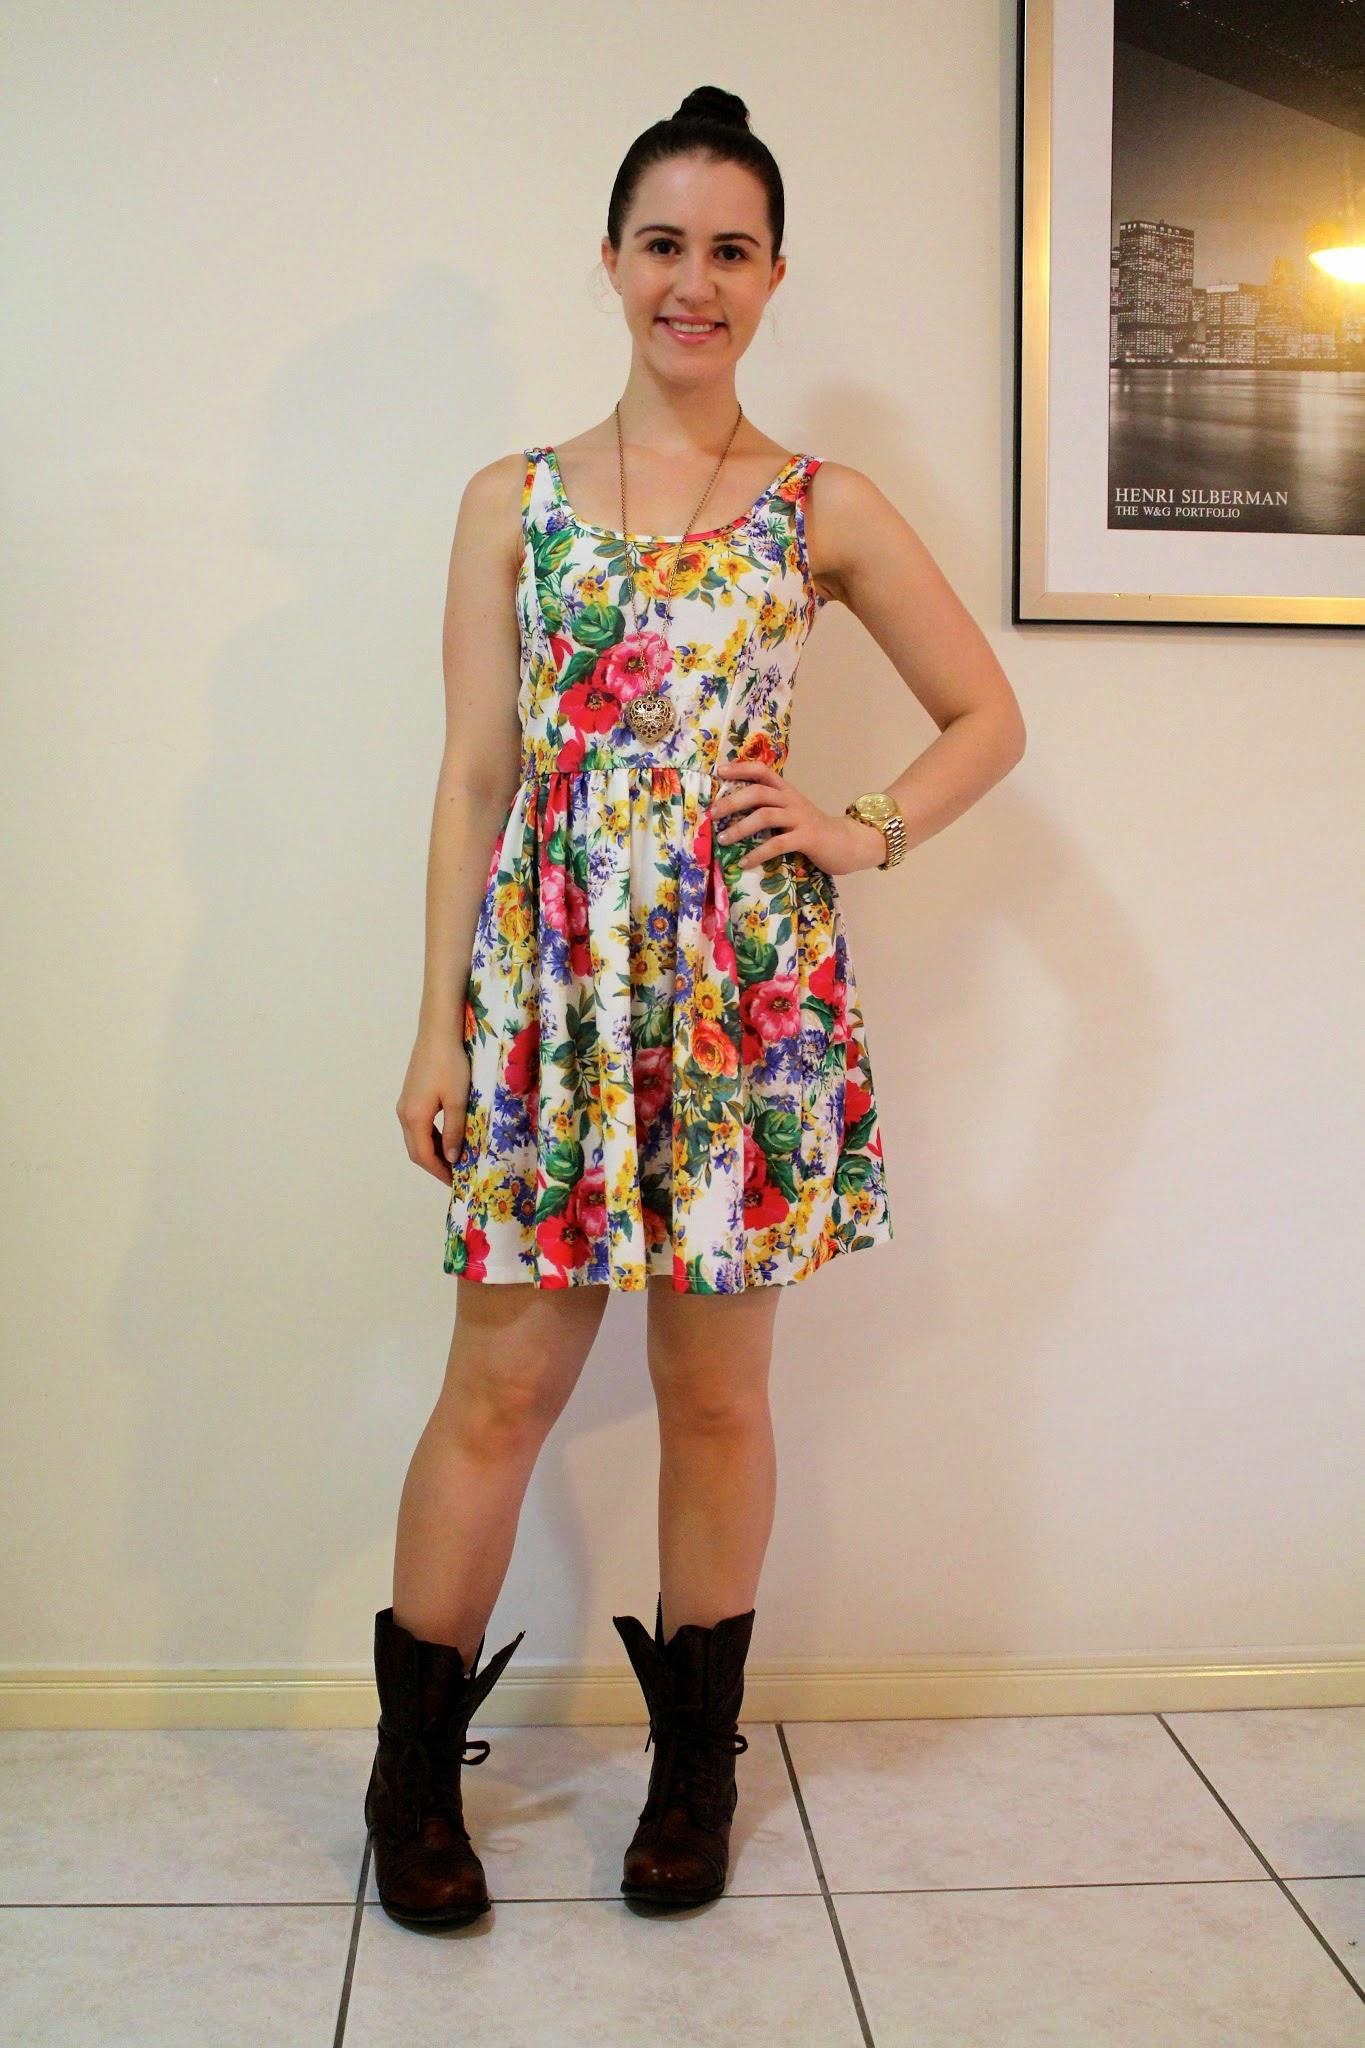 floral dress combat boots brie s world